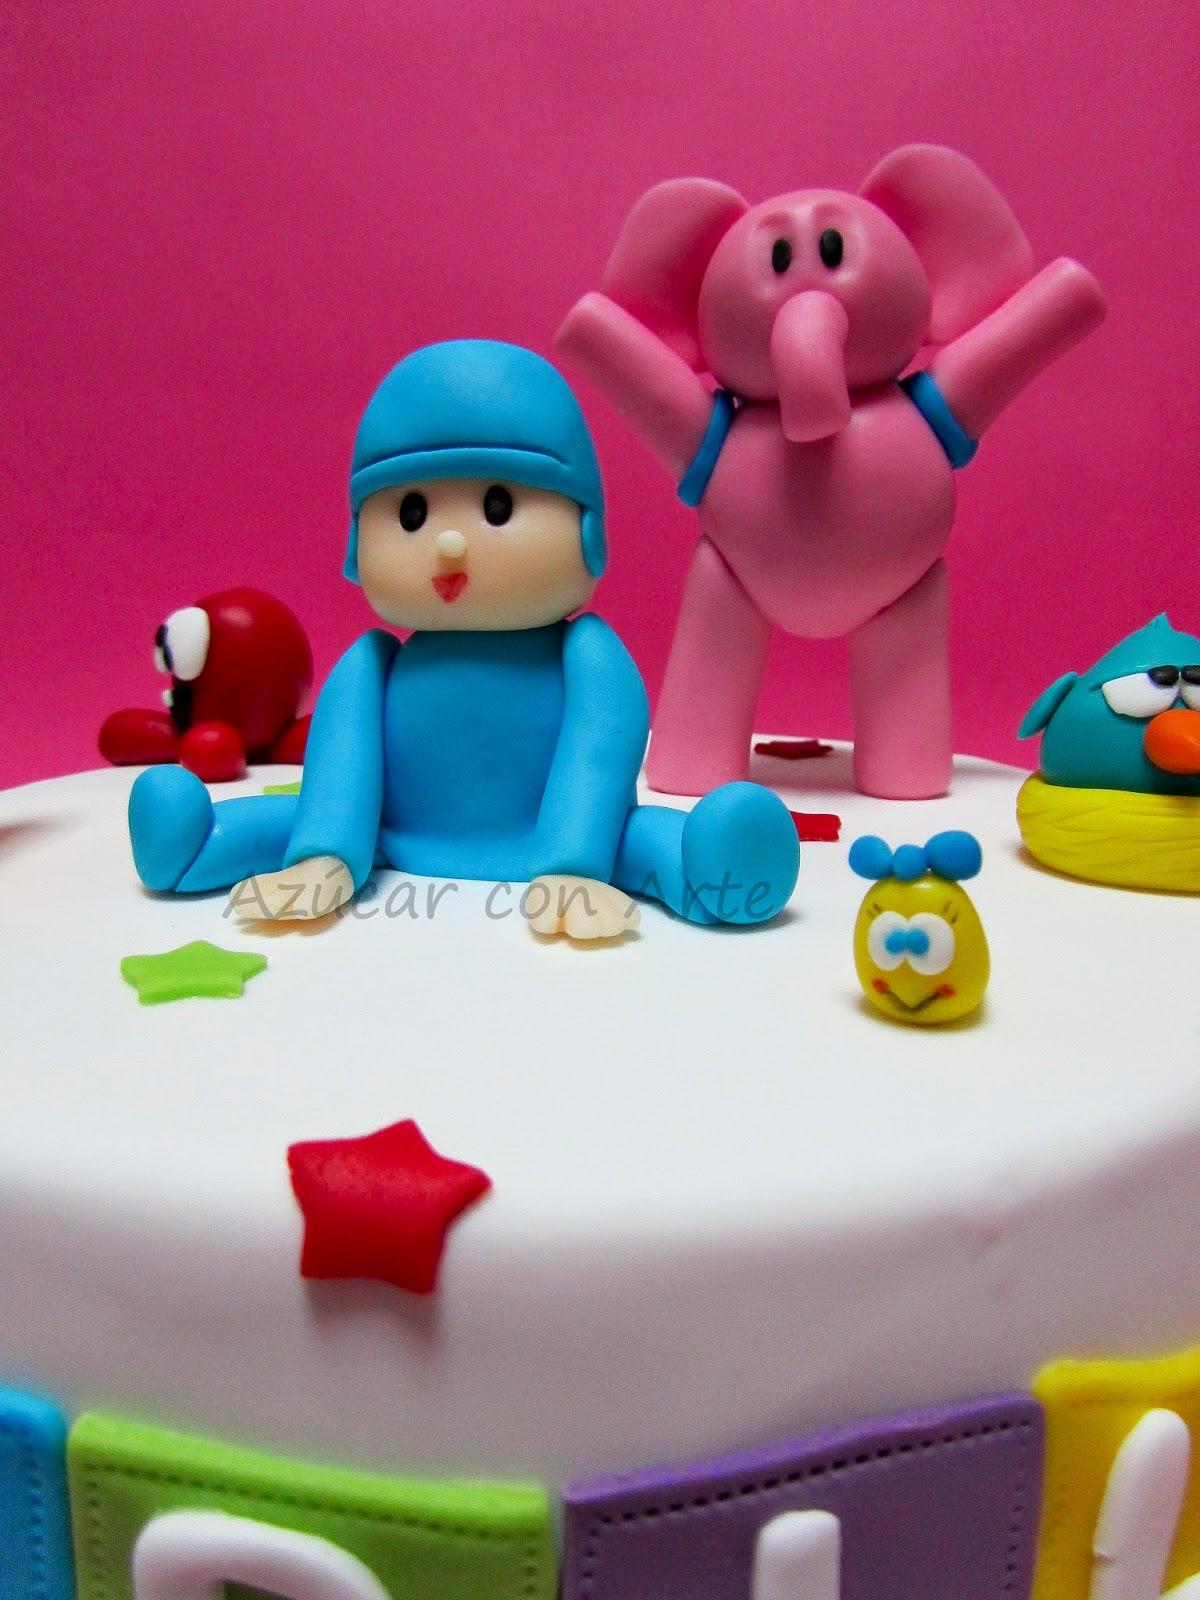 Pocoyo, pocoyo cake, gluten free cake  azucar con arte